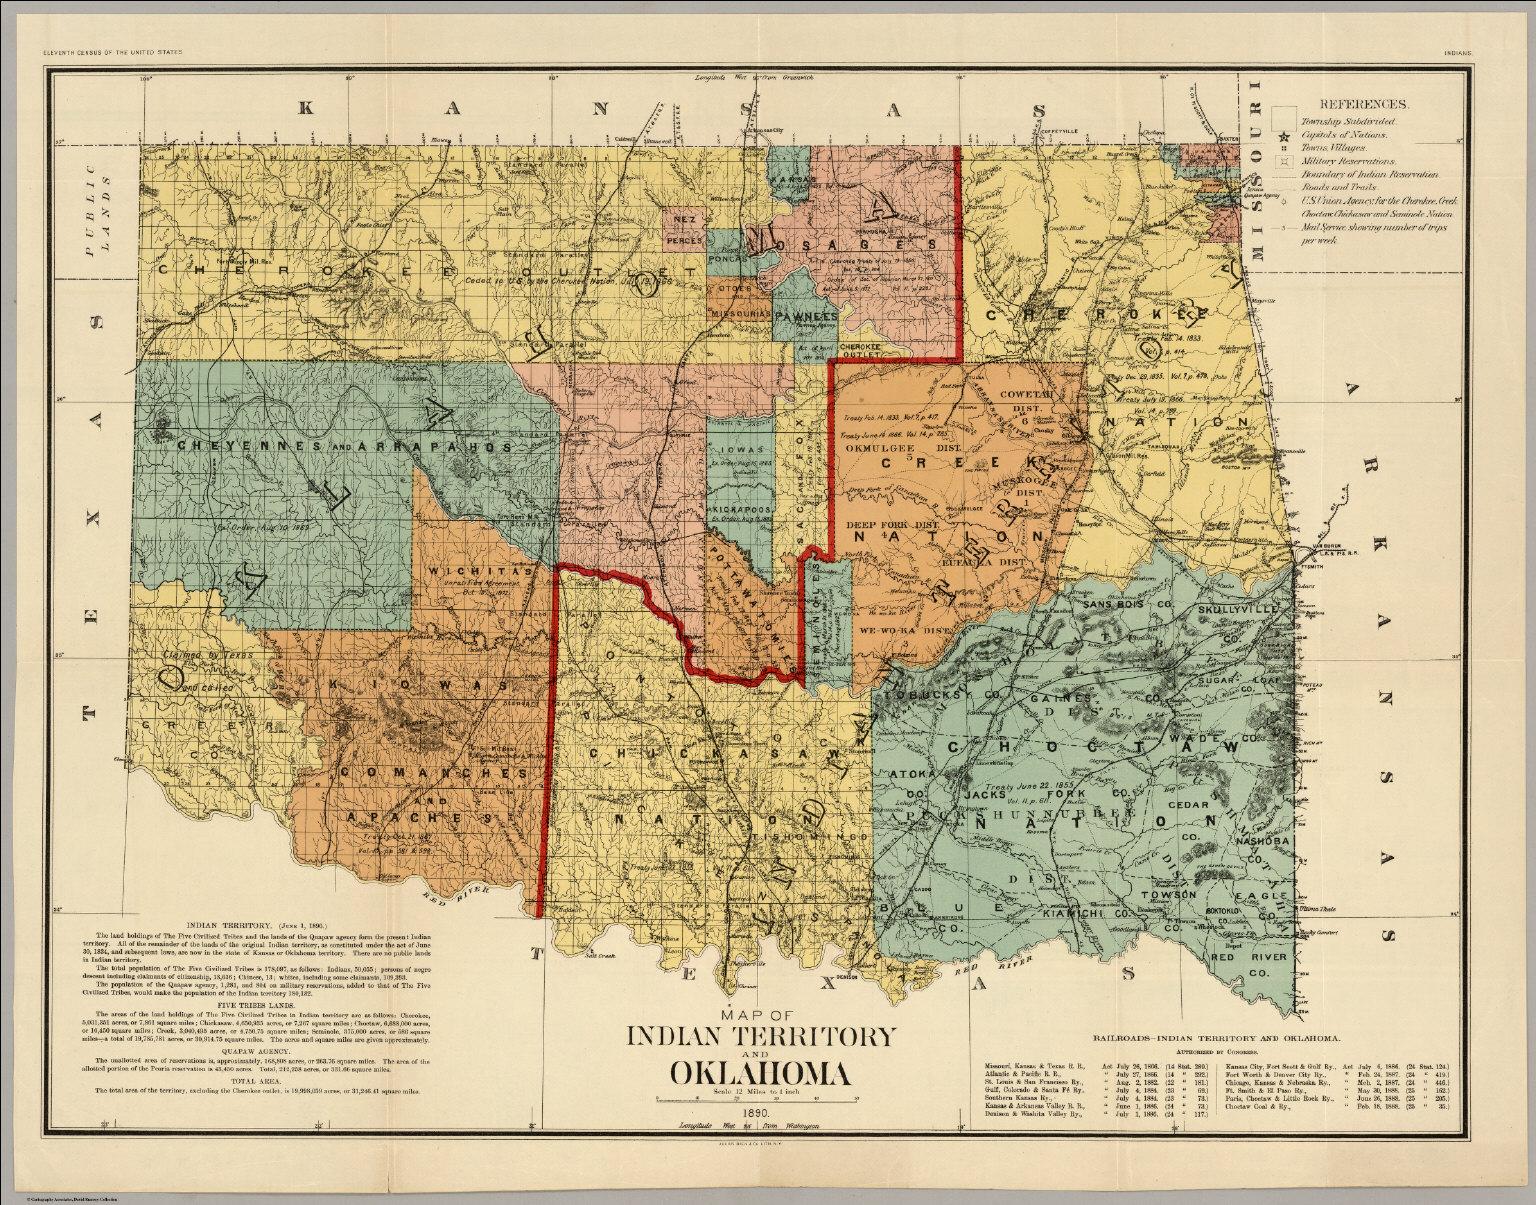 oklahoma indian territory1890 28